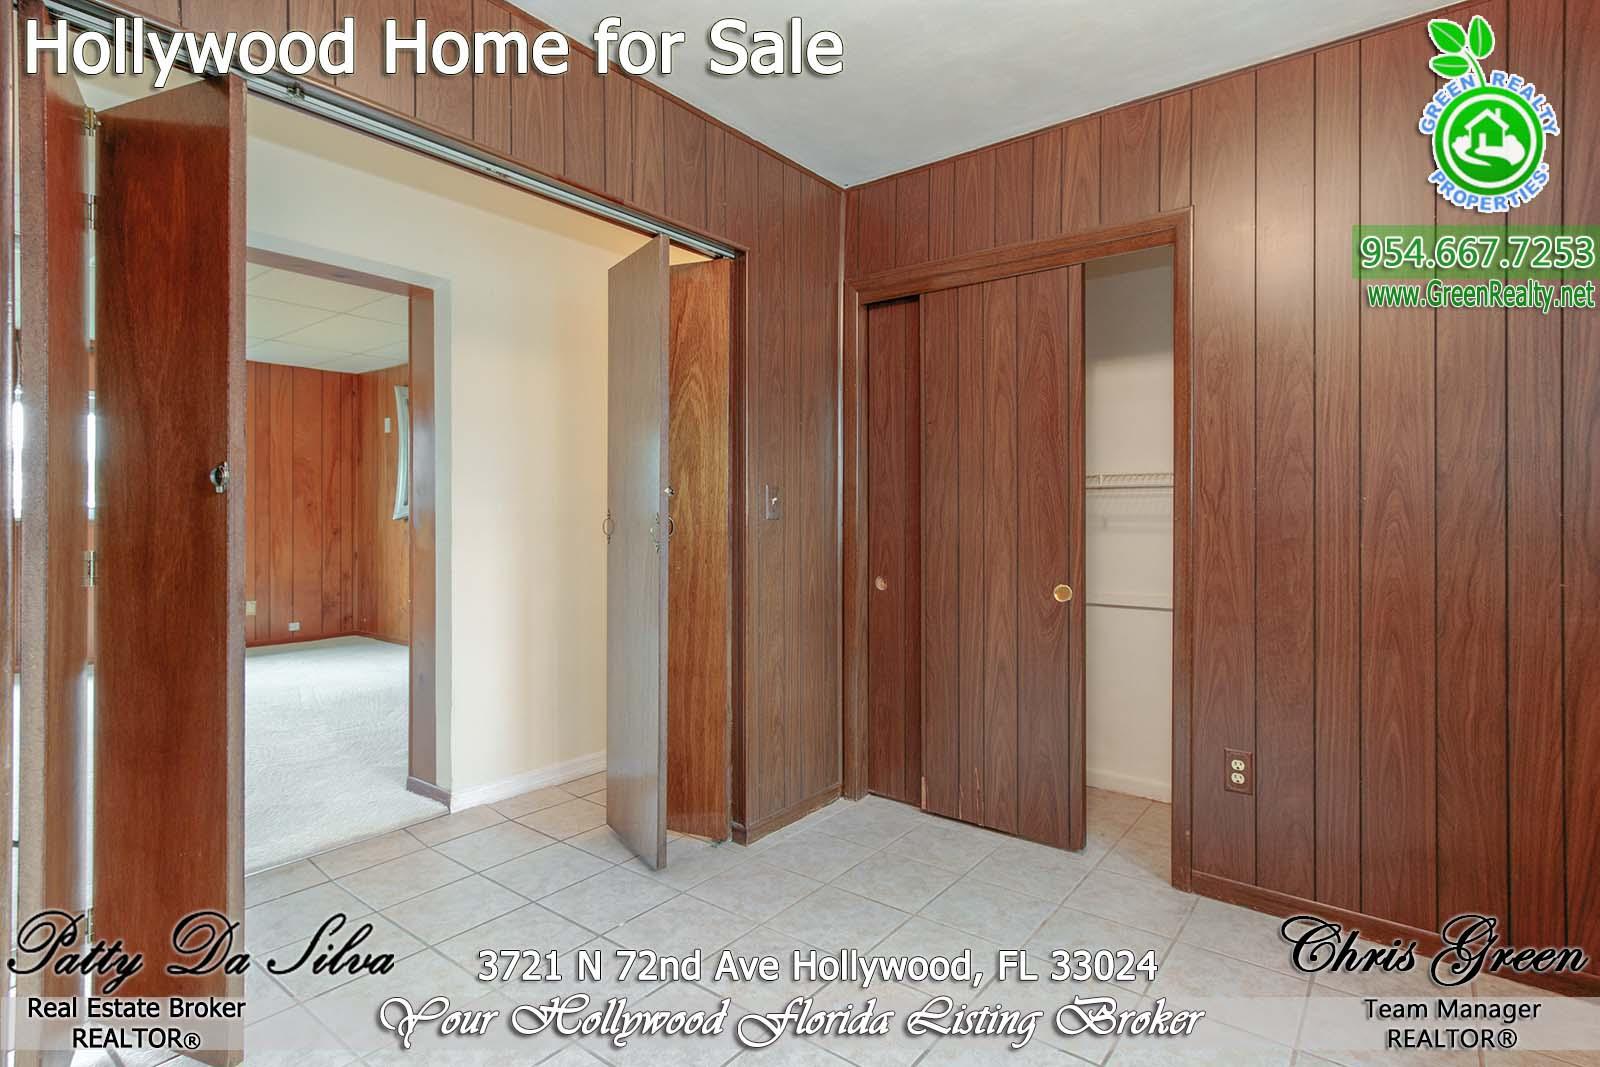 16 Hollywood Florida Real Estate Listing Patty Da Silva Green Realty properties (15)